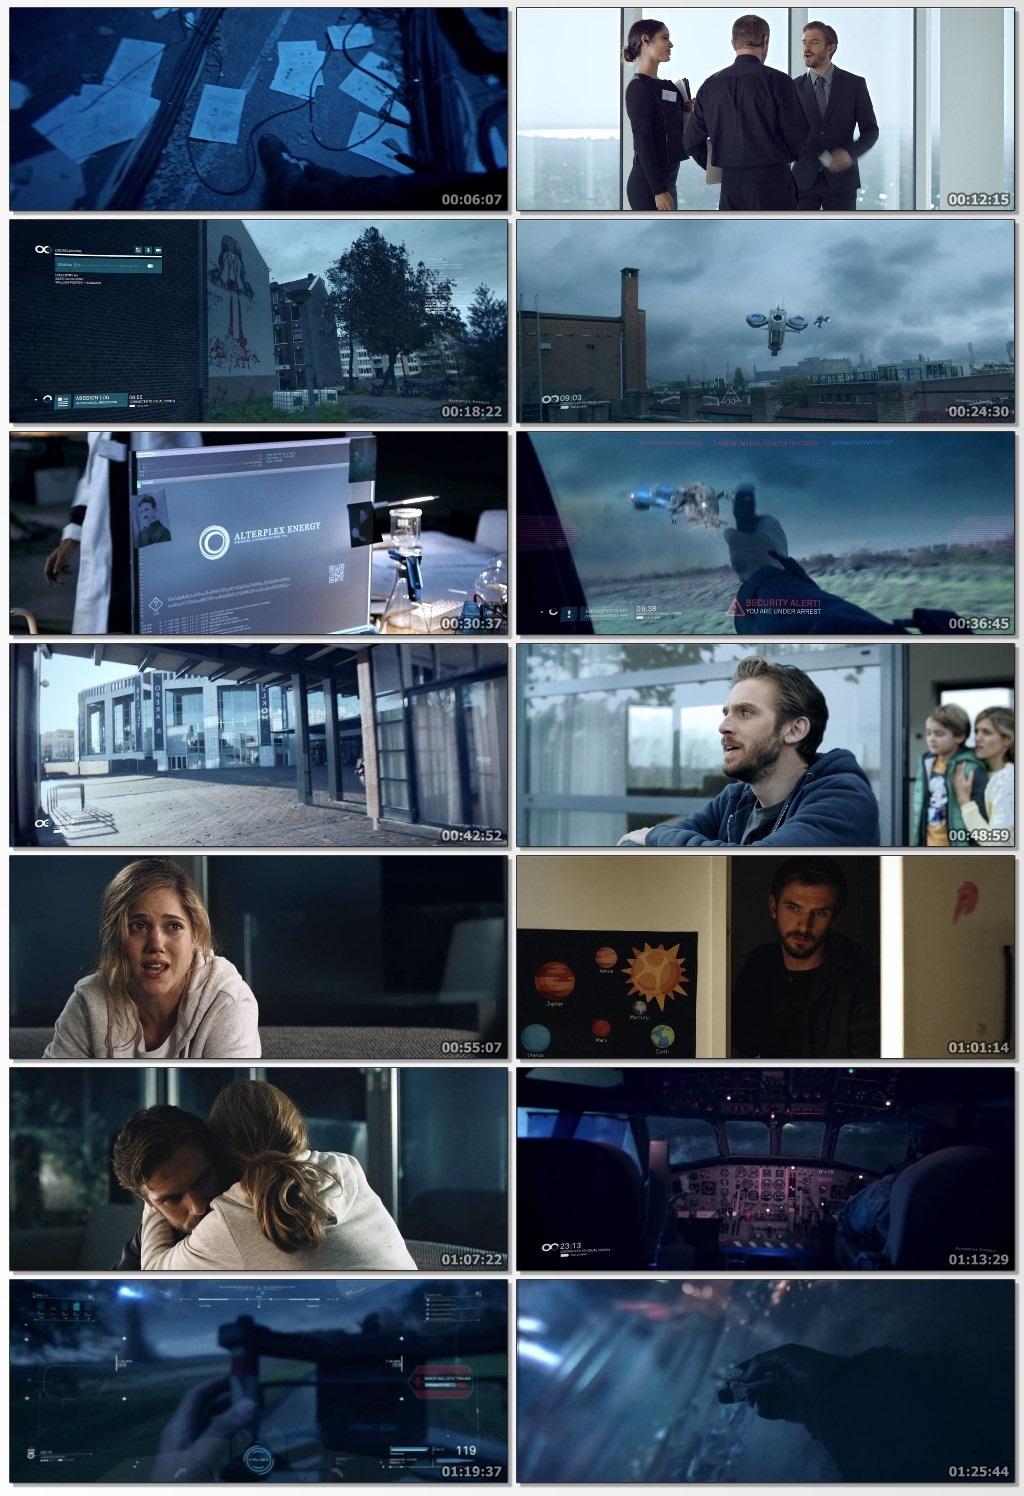 Kill-Switch-2017-www-1kmovies-org-Hindi-Dual-Audio-720p-Blu-Ray-ESubs-850-MB-mkv-thumbs